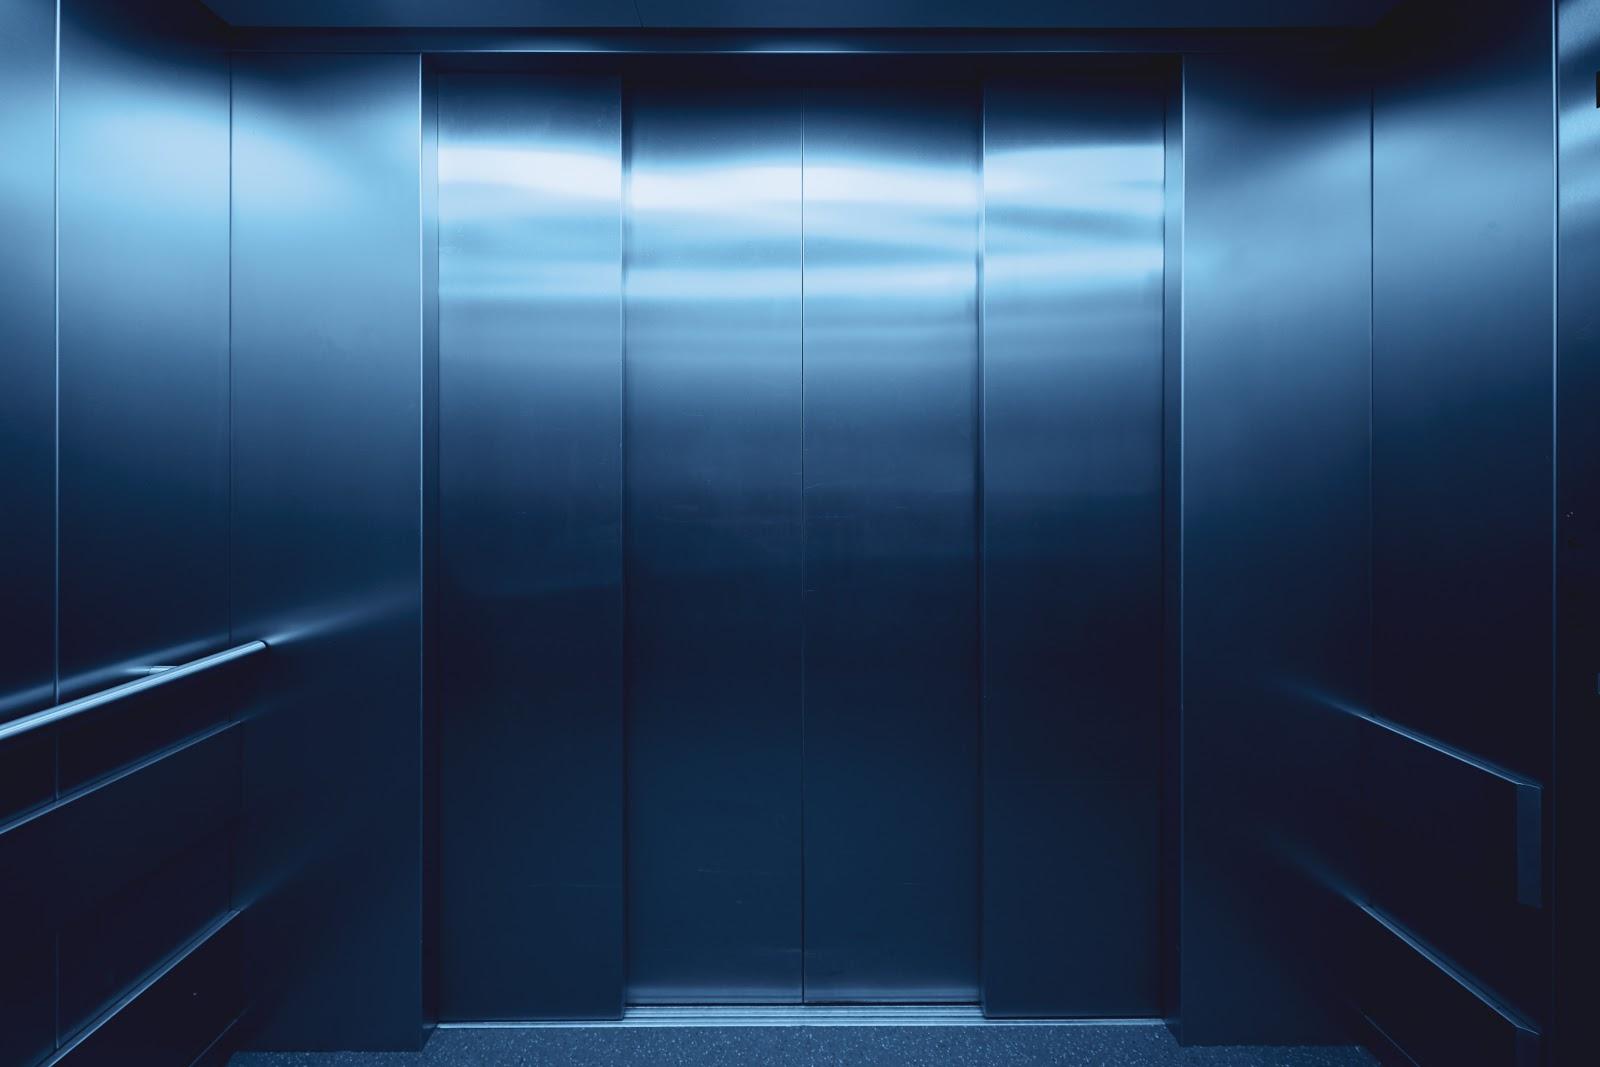 QmUjevhhrT6QRp oPtnuT75VBysBkZhtXm6otCGCo9mMAs50u5cdKp7t SUJv3sfguVXdcswK8R mOUus9IeiP40uw9C9oVP5mb00Z2MwLGvMd AXgv1QHbdPQRCHJRIhsx R28a - Tipos de ascensores para su edificio